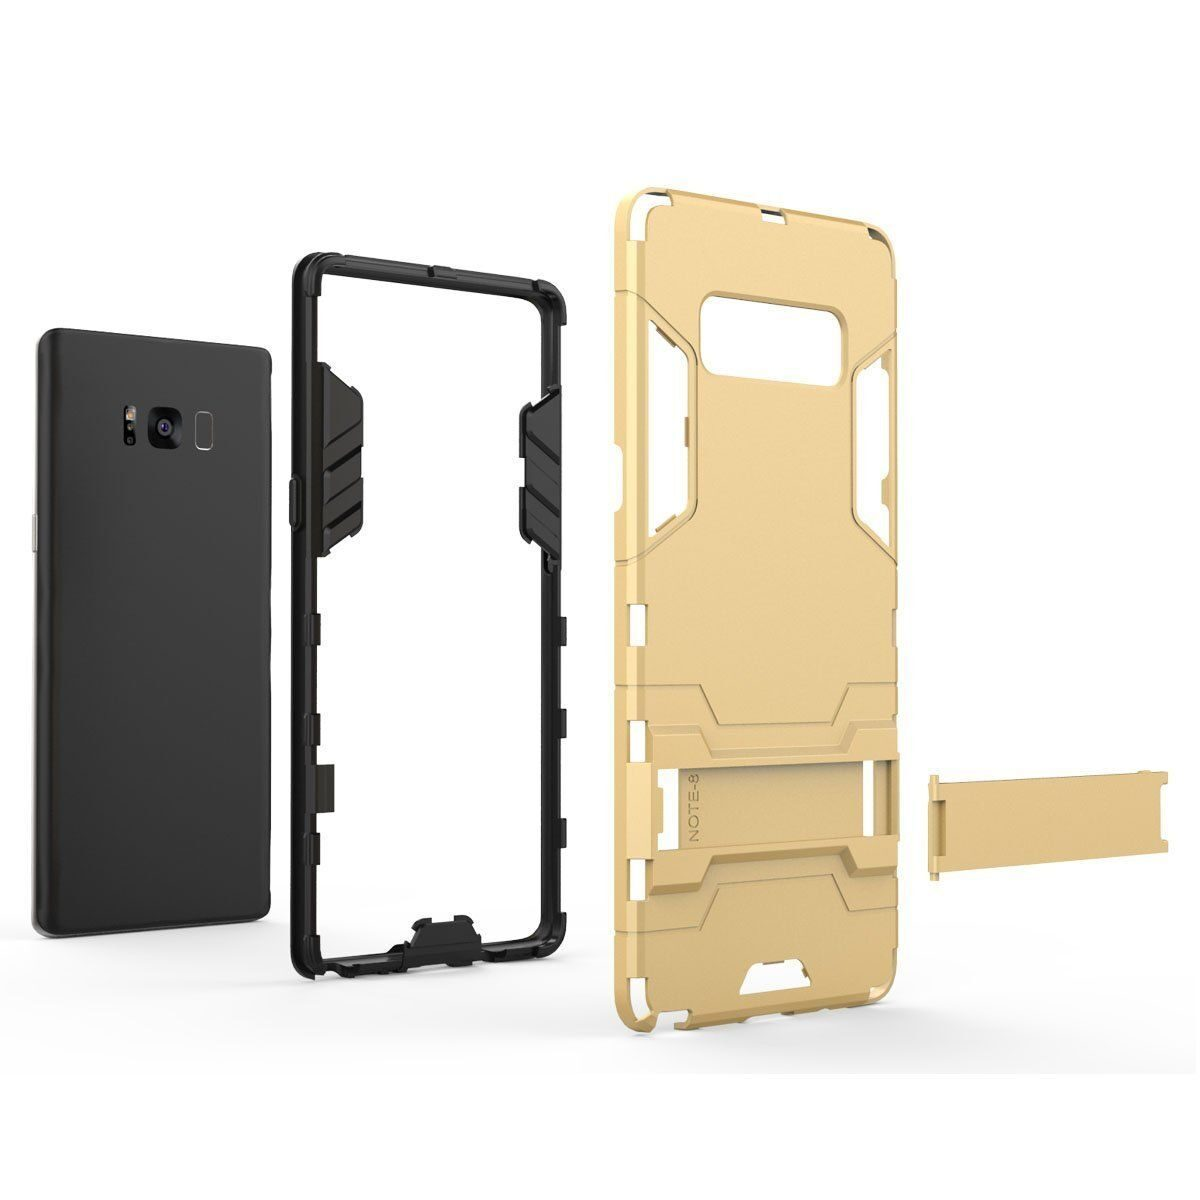 Чехол-накладка Samsung SM-G928 Galaxy S6 Edge+ Silver Glitter Cover EF-XG928CSEGRU